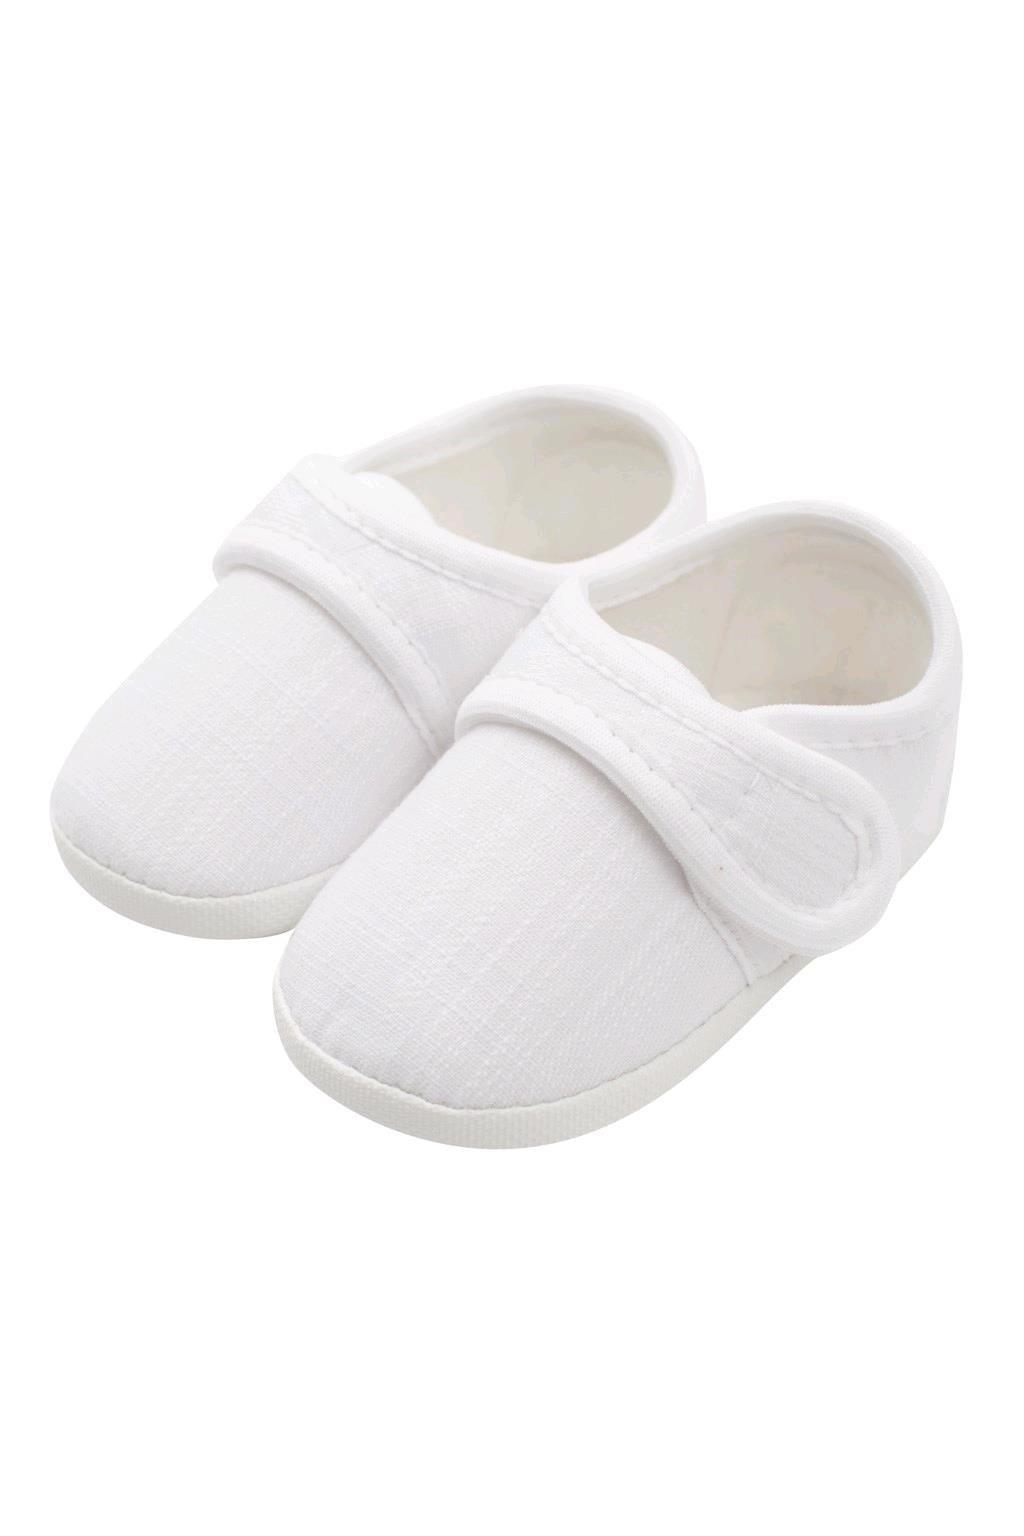 Dojčenské capačky New Baby Linen biele 3-6 m